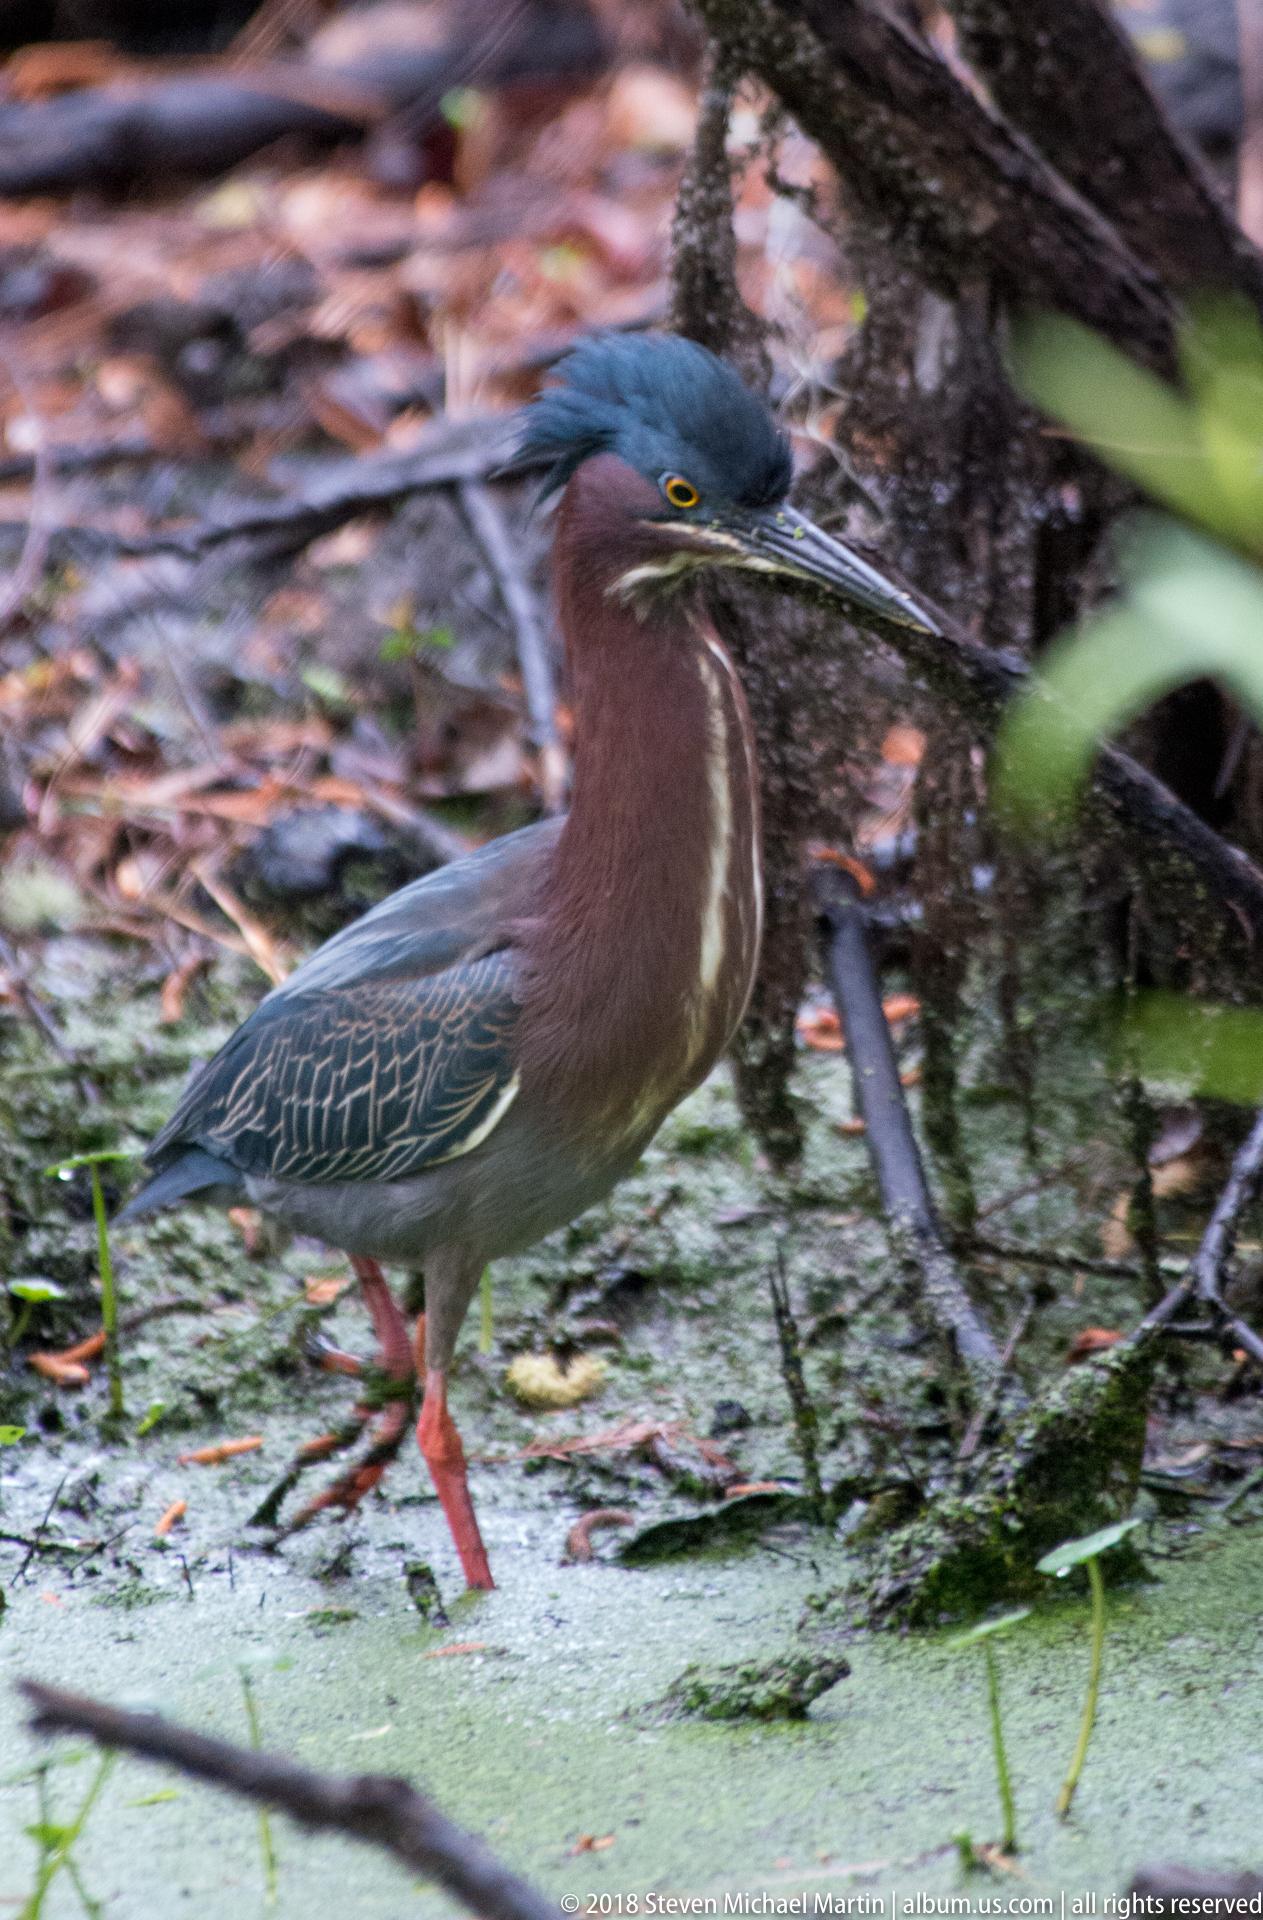 SMartin_2018 Charleston Audubon (51 of 106)